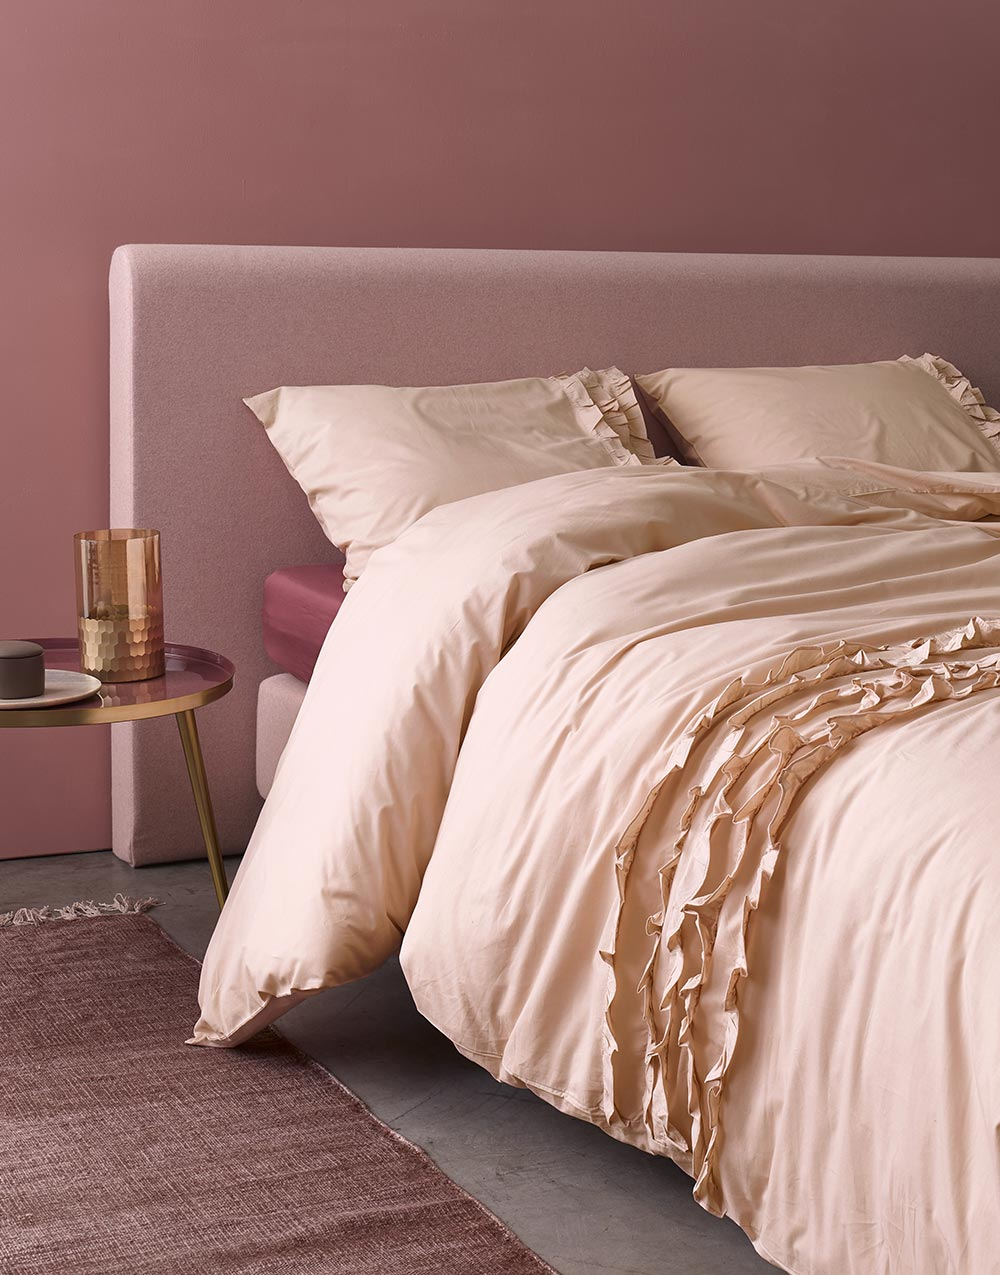 interiorlicious_slaapkamer_essenza_metze_dekbedovertrek_rose